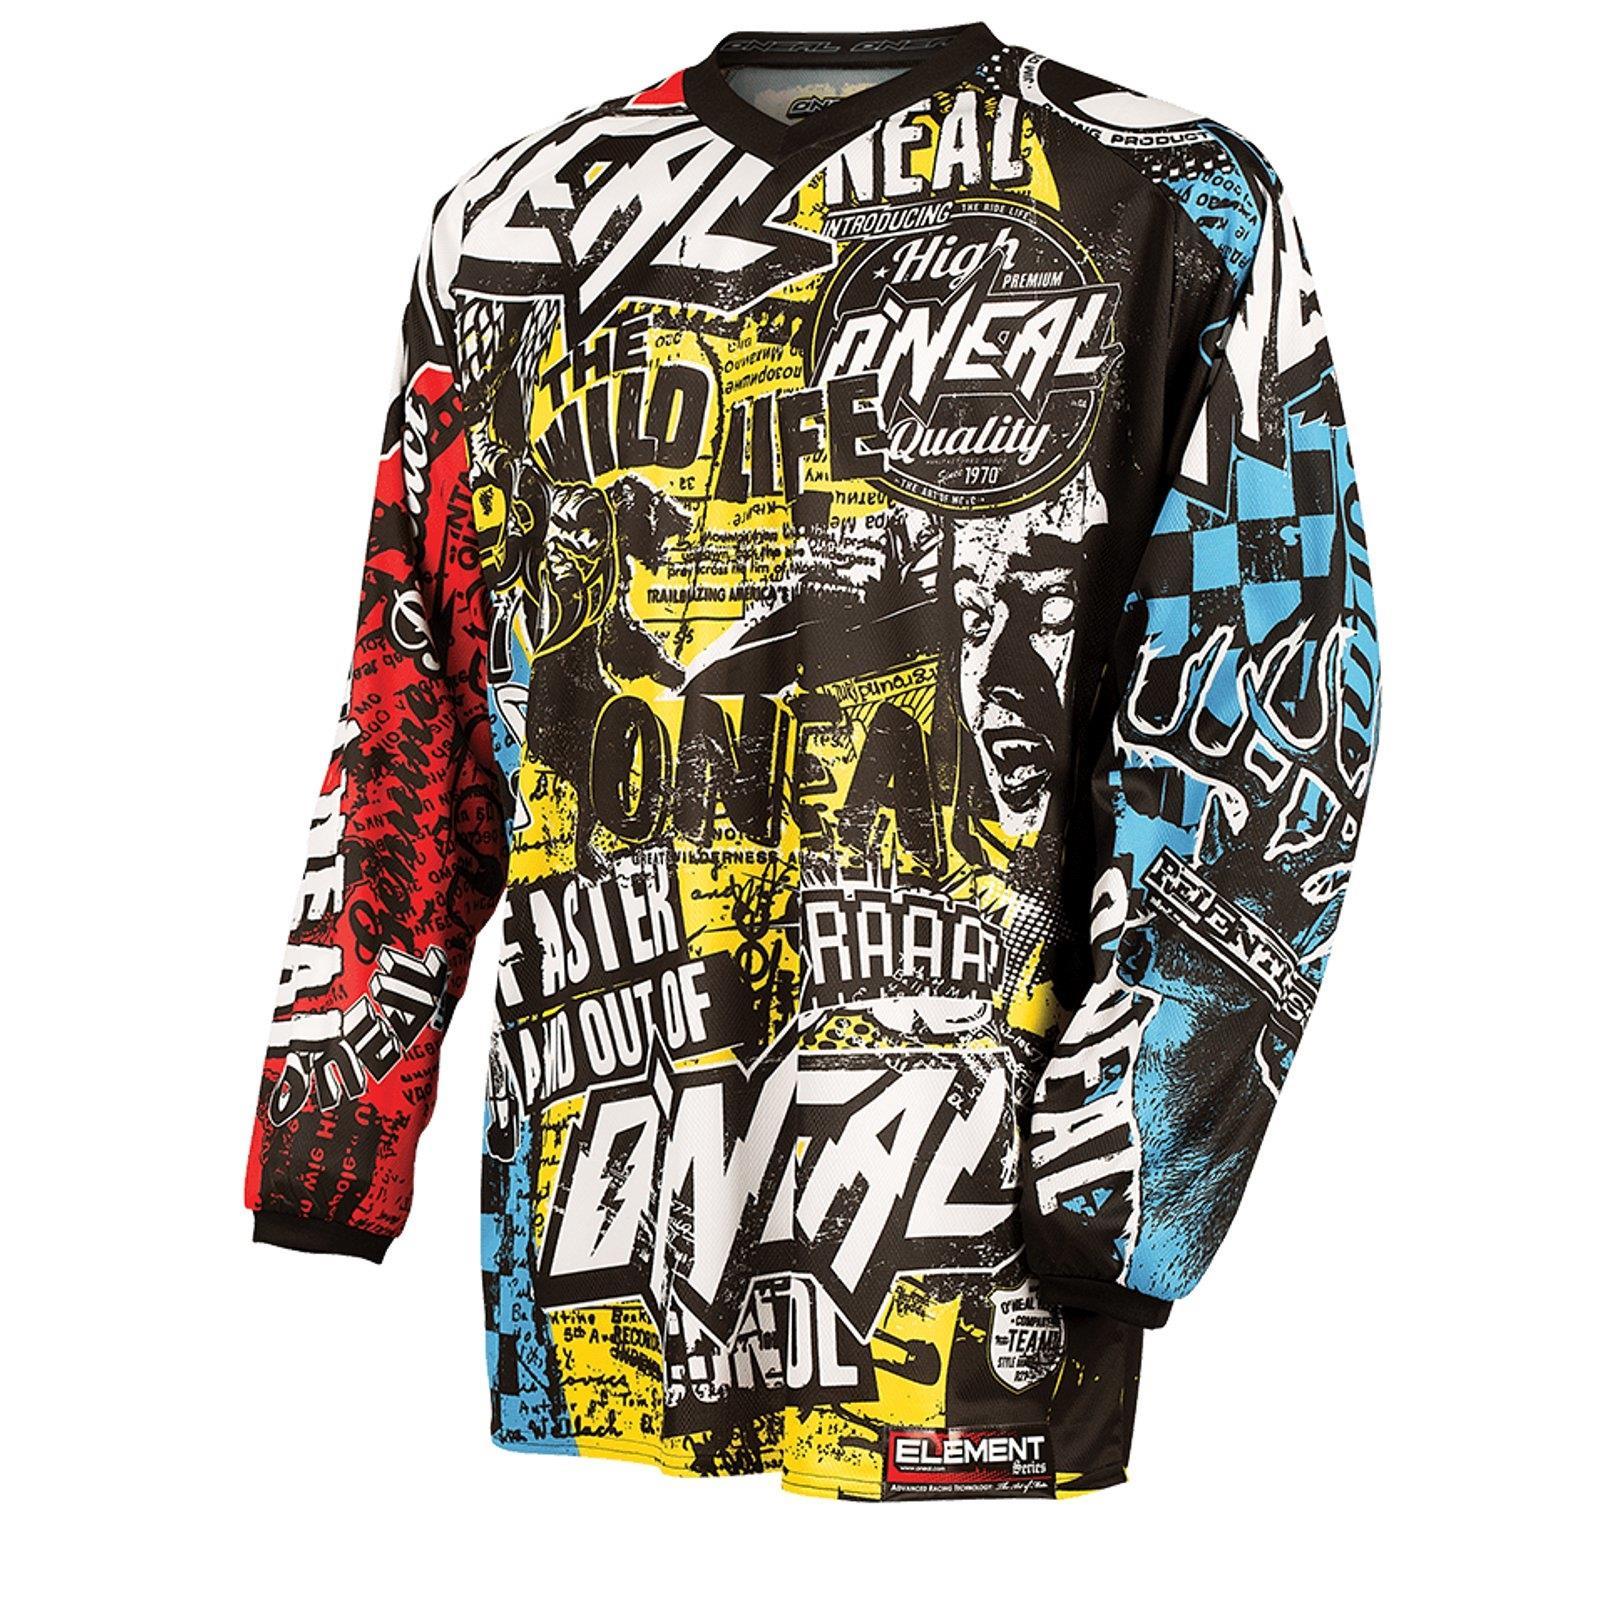 ONEAL-Element-MX-Jersey-Shirt-WILD-MOTO-CROSS-MOUNTAIN-BIKE-ENDURO-MTB-DOWNHILL miniatura 3